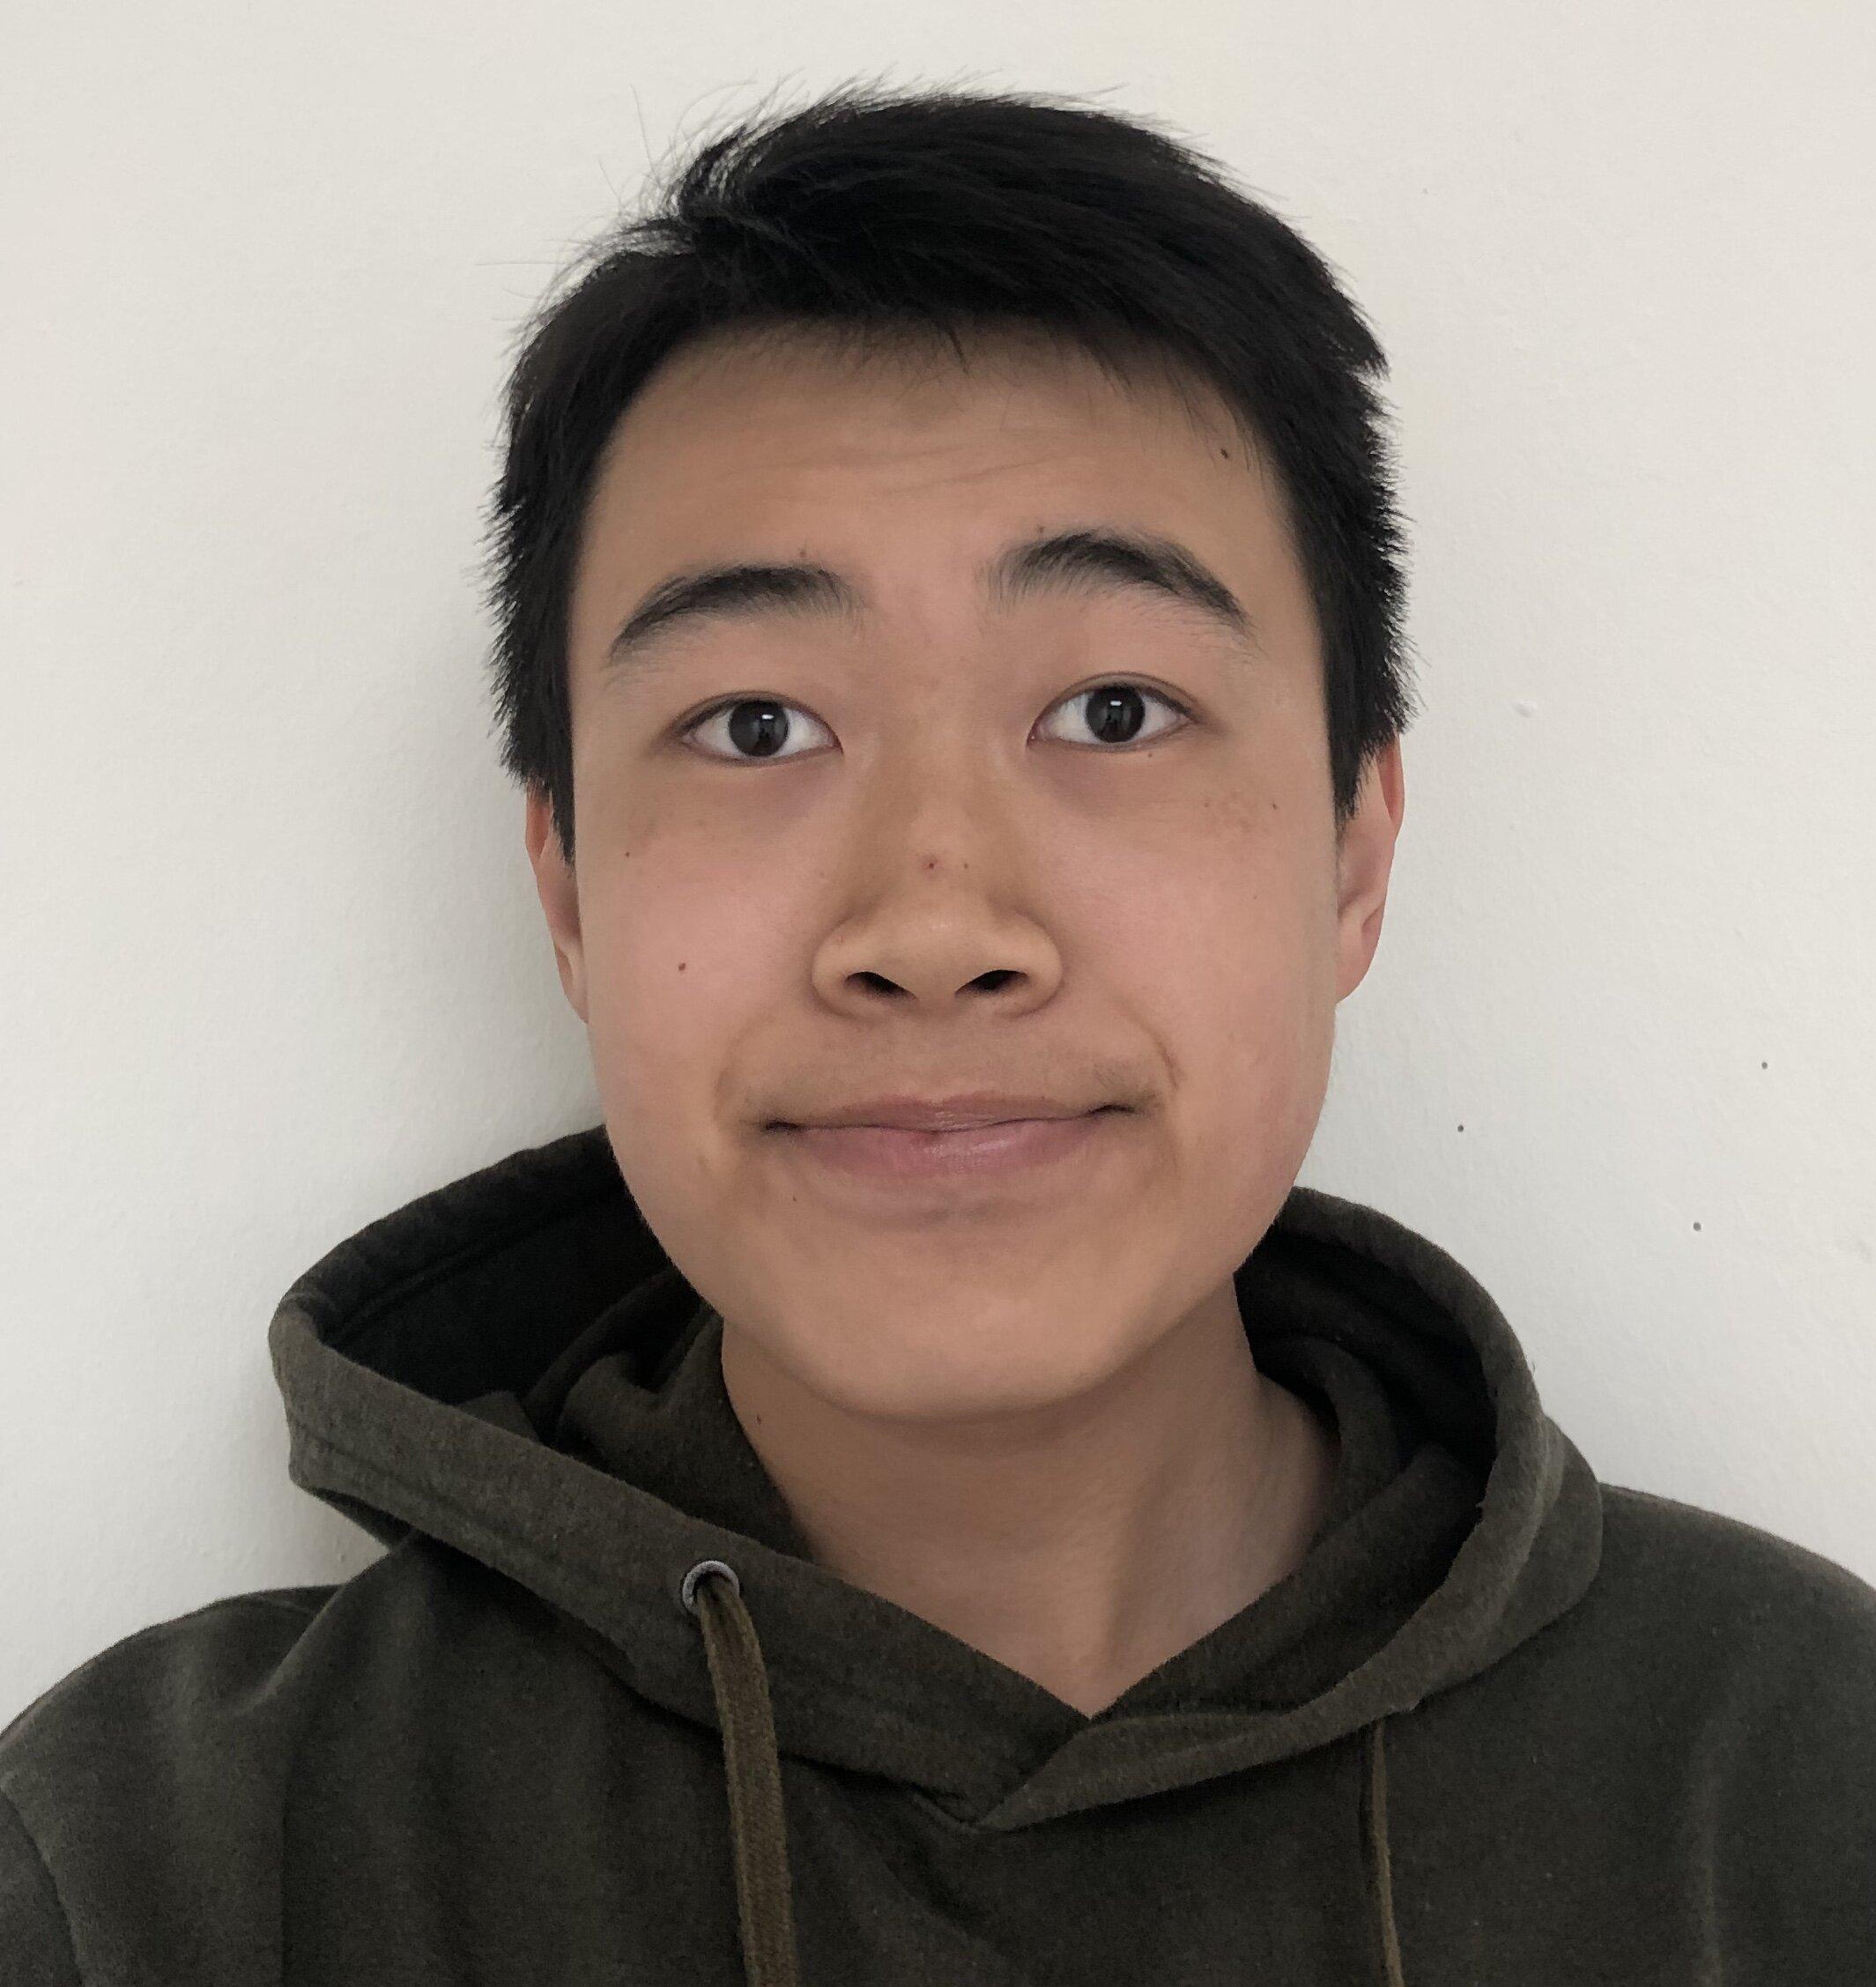 Alexander Wang - Director of Operations